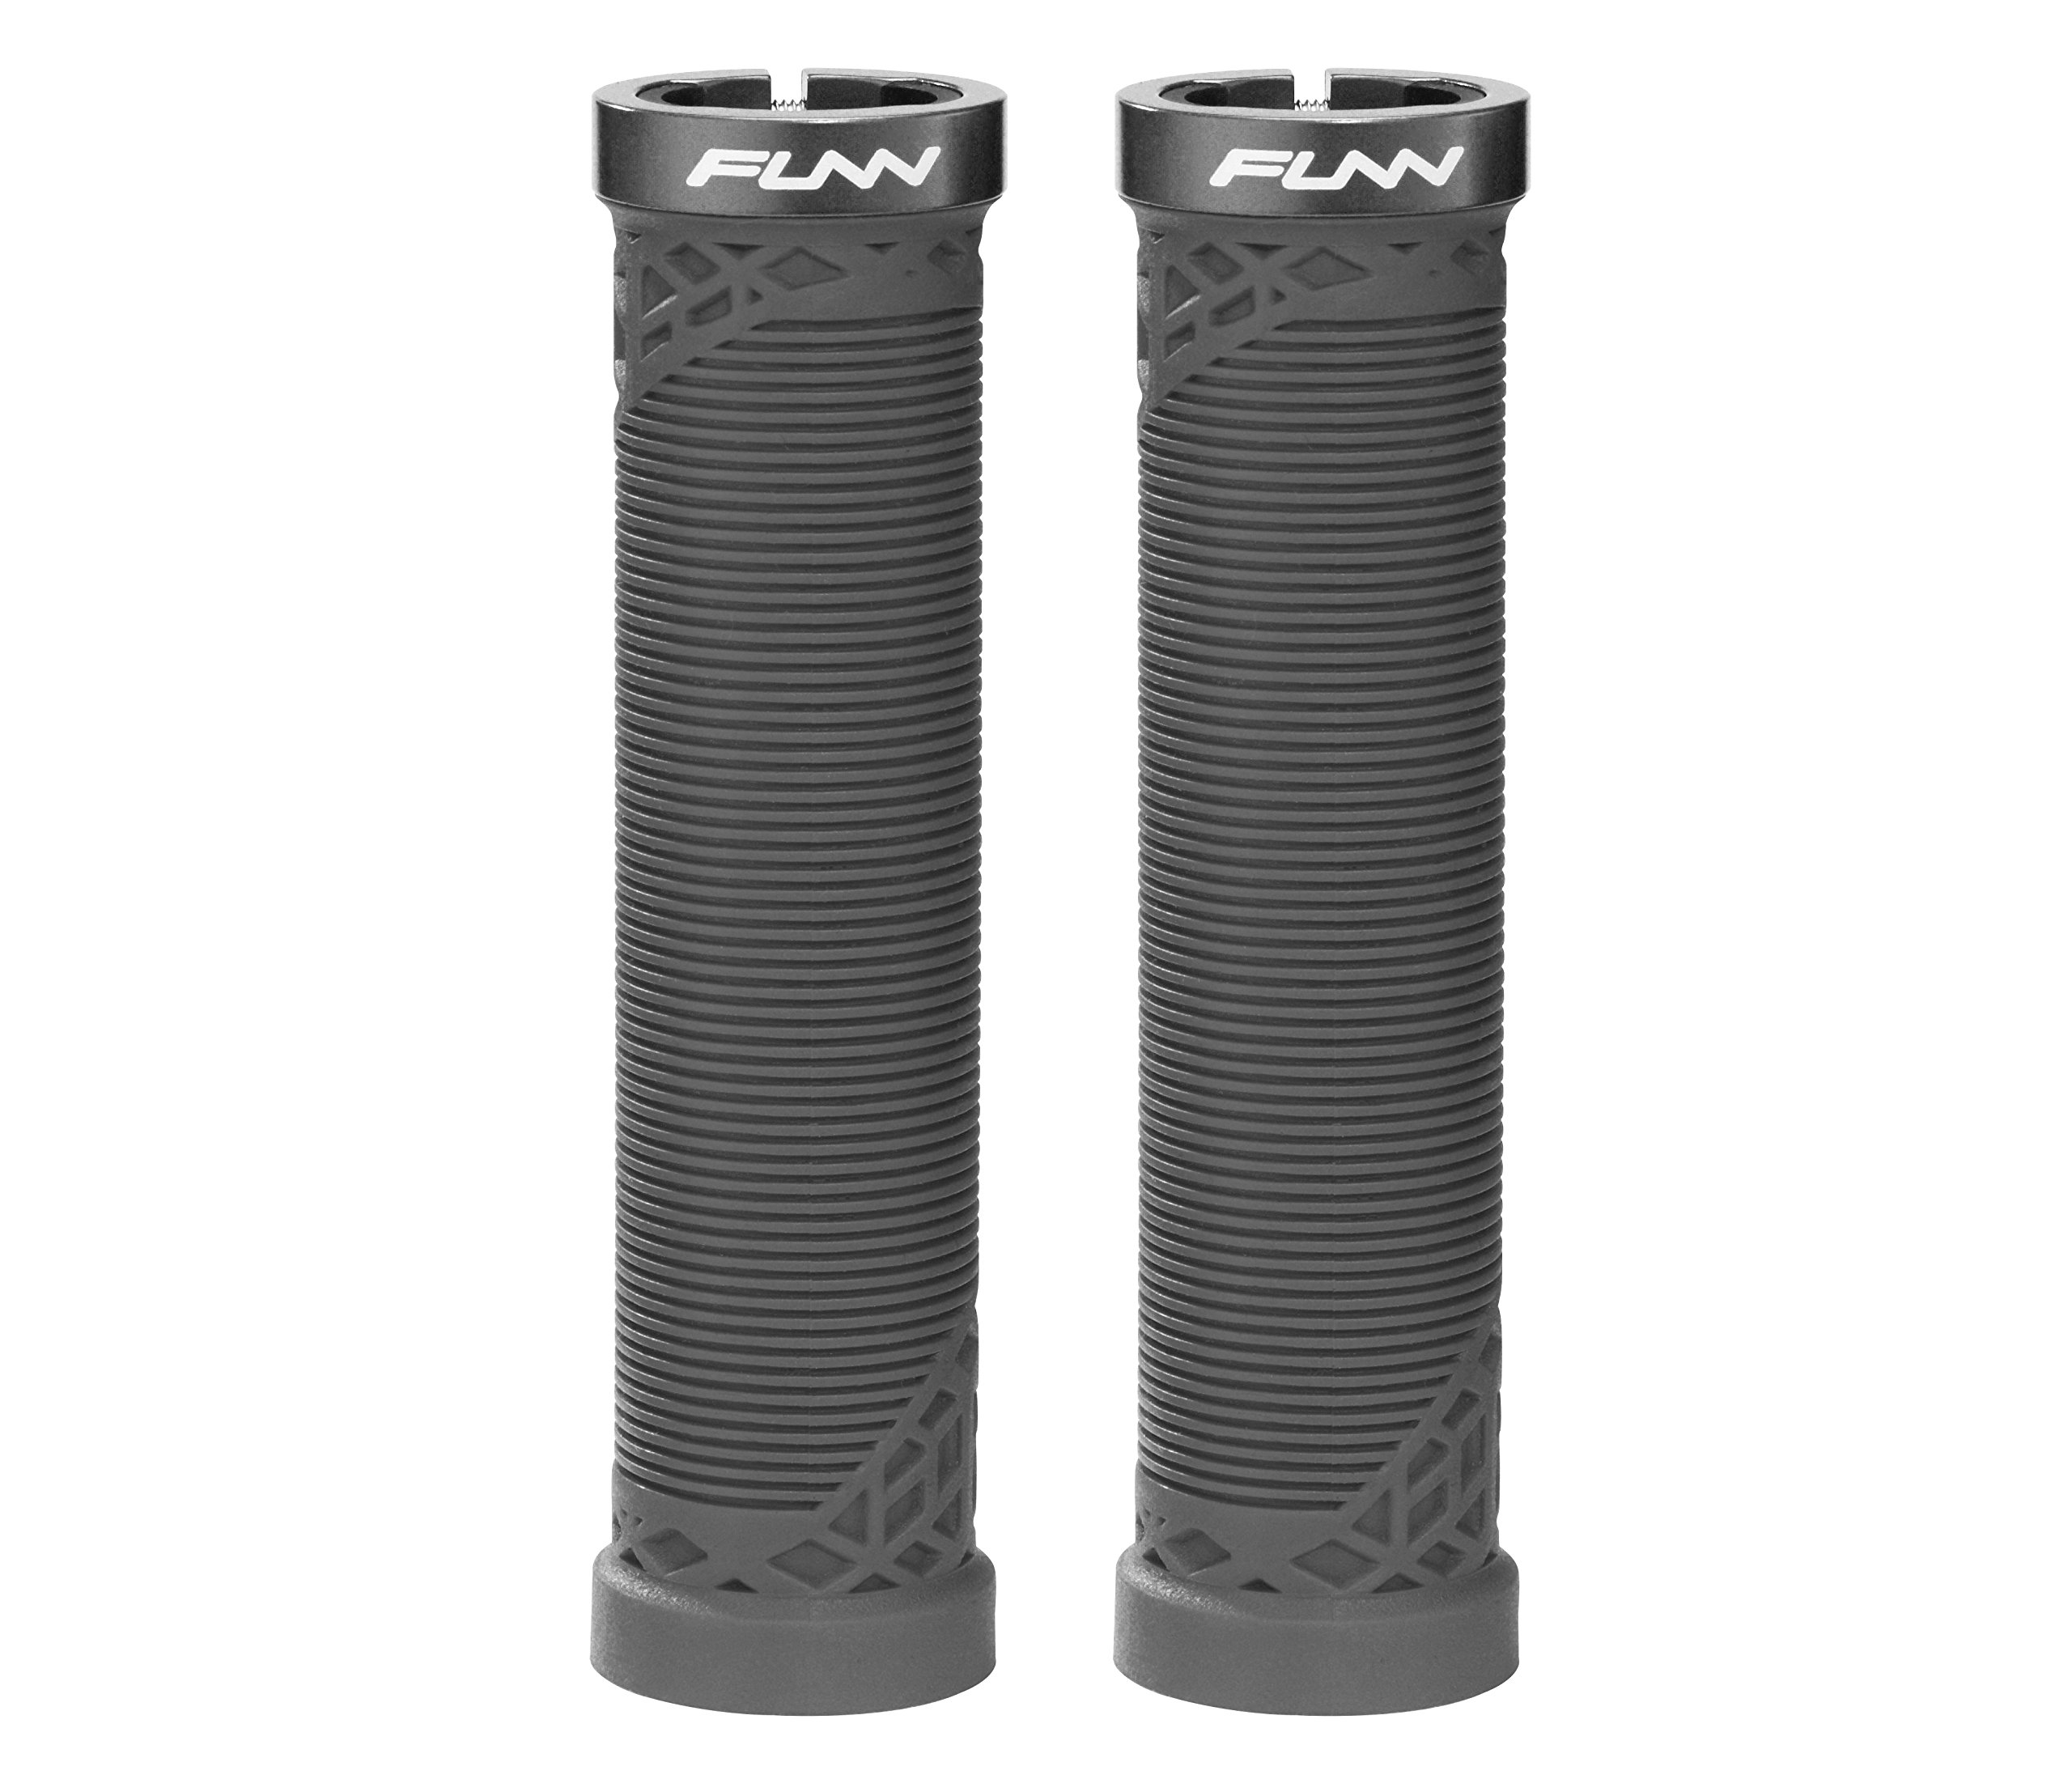 Funn Hilt Mountain Bike Handlebar Grips with Single Lock-on Clamp, Lightweight and Ergonomic Grips for MTB (Black)